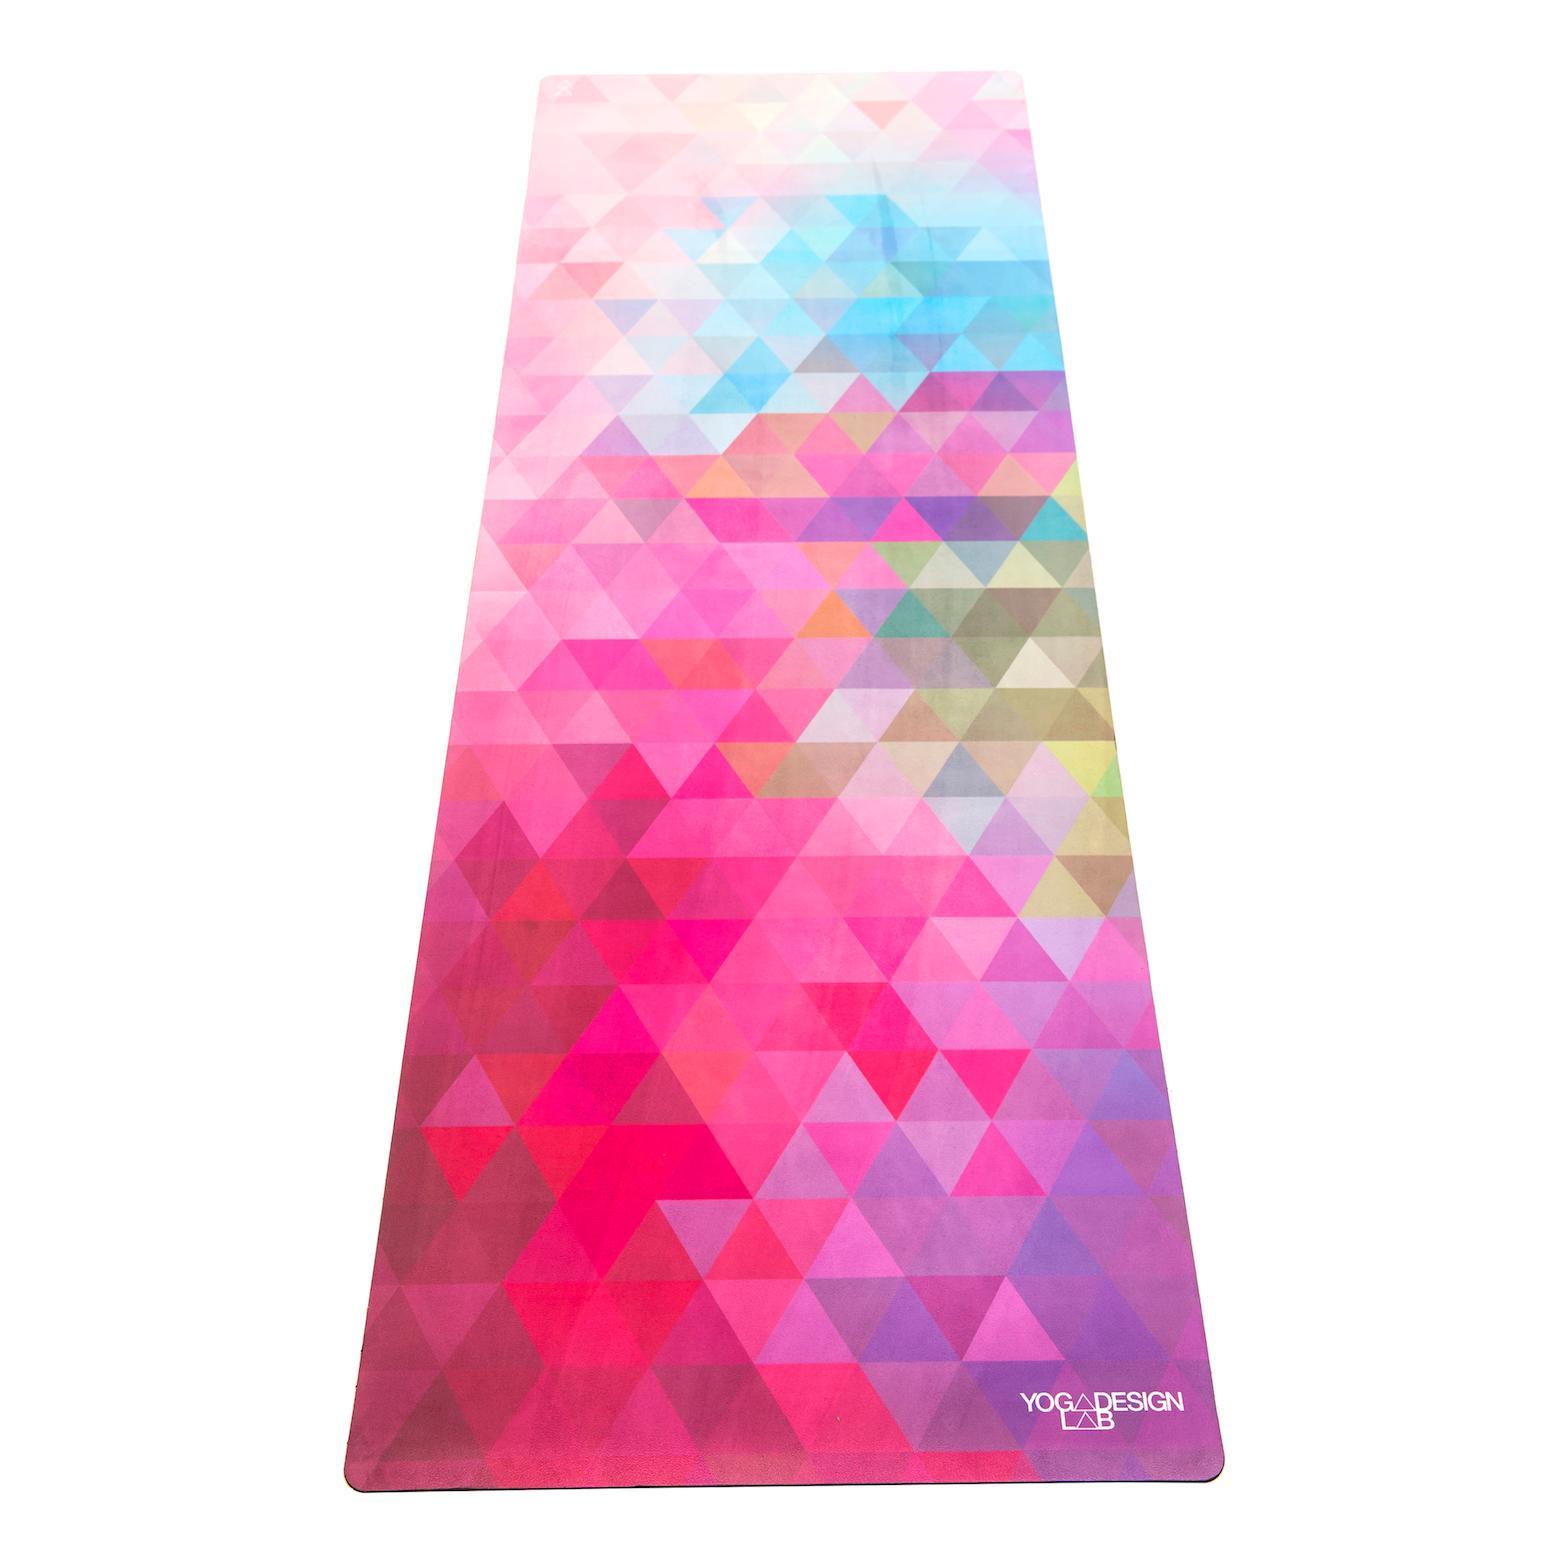 1.5mm Travel Yoga Mat - Tribeca Sand